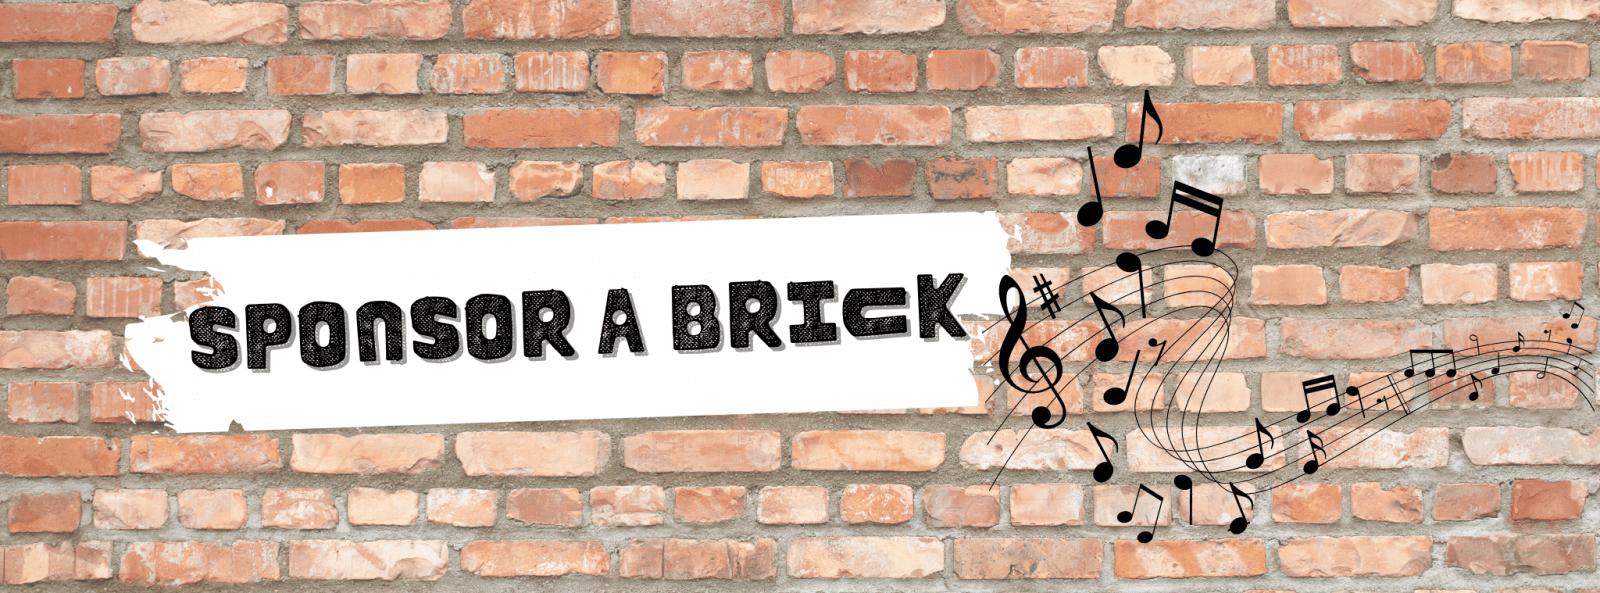 Sponsor a brick banner